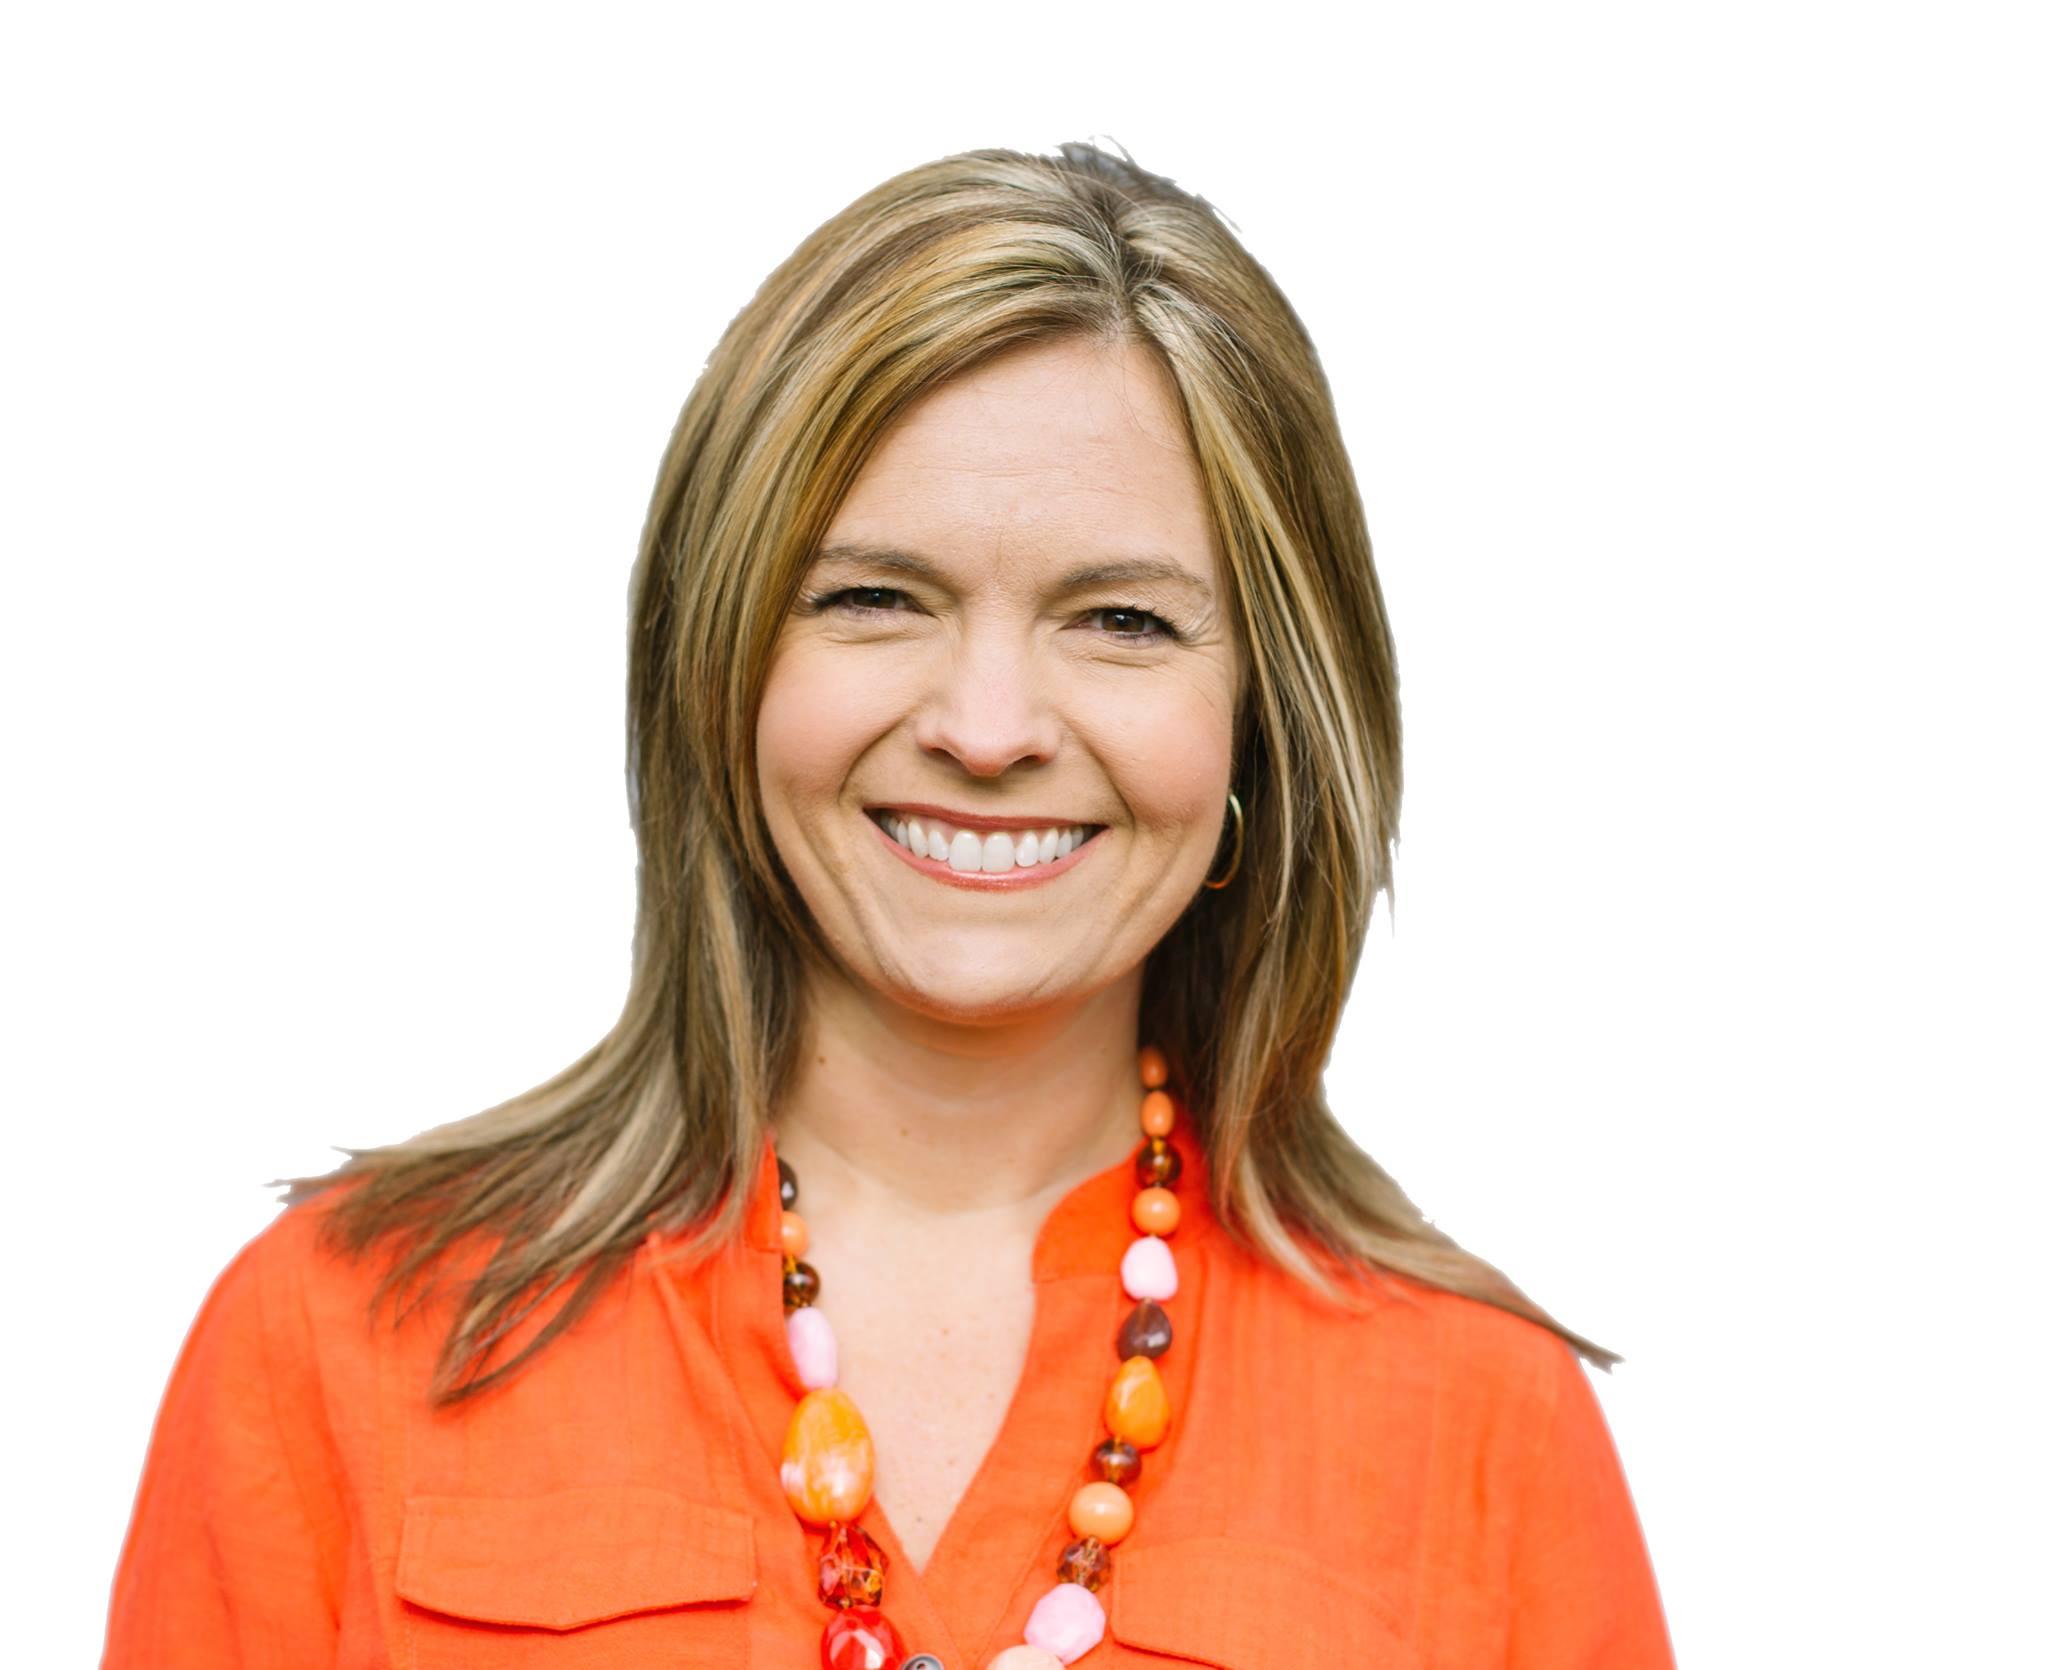 Heather Creekmore Your Spiritual Game Plan